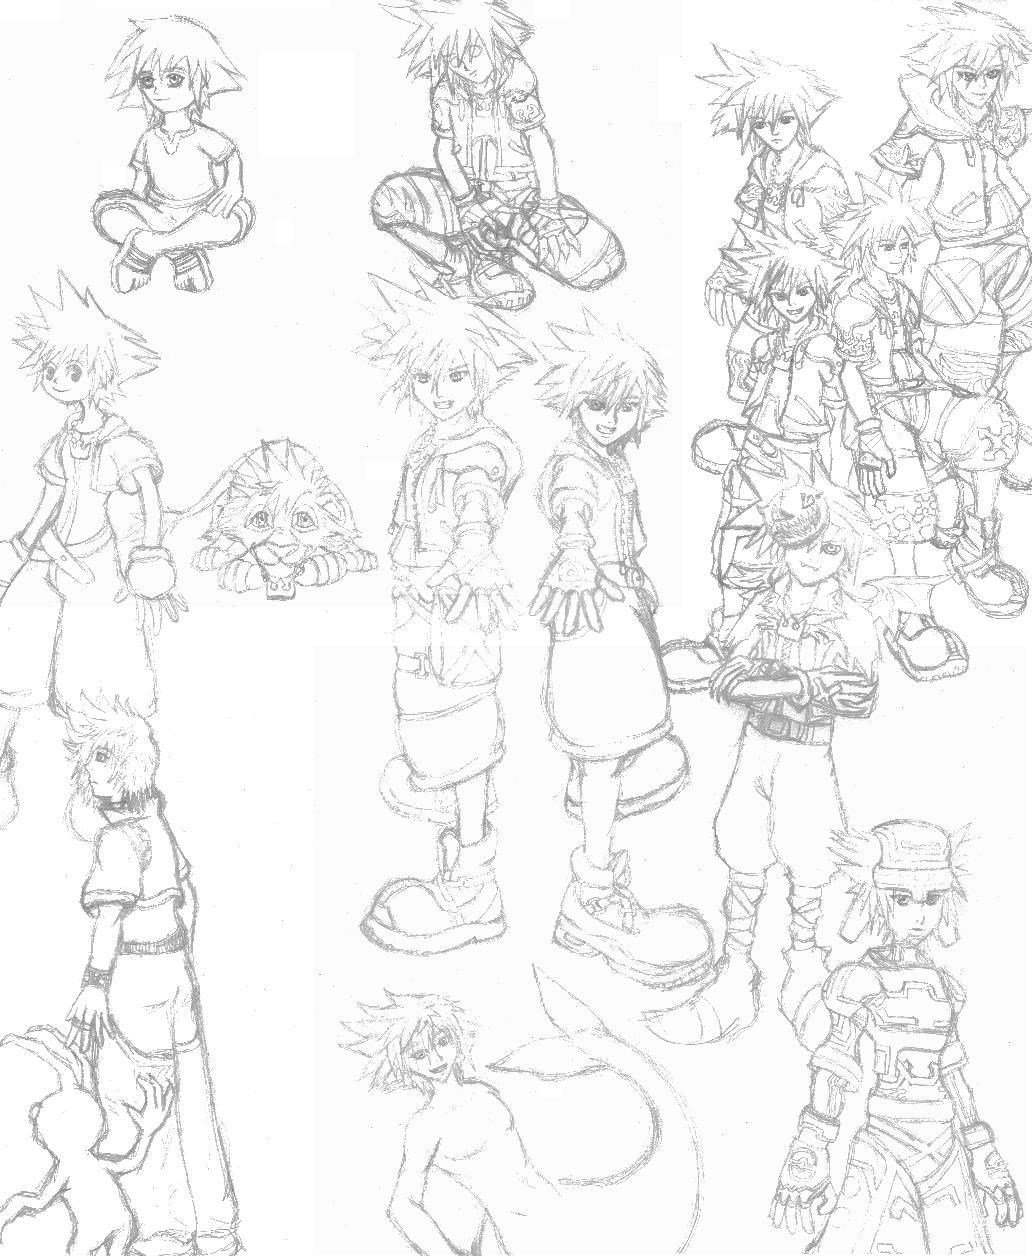 All the Soras by Emeraldwolf